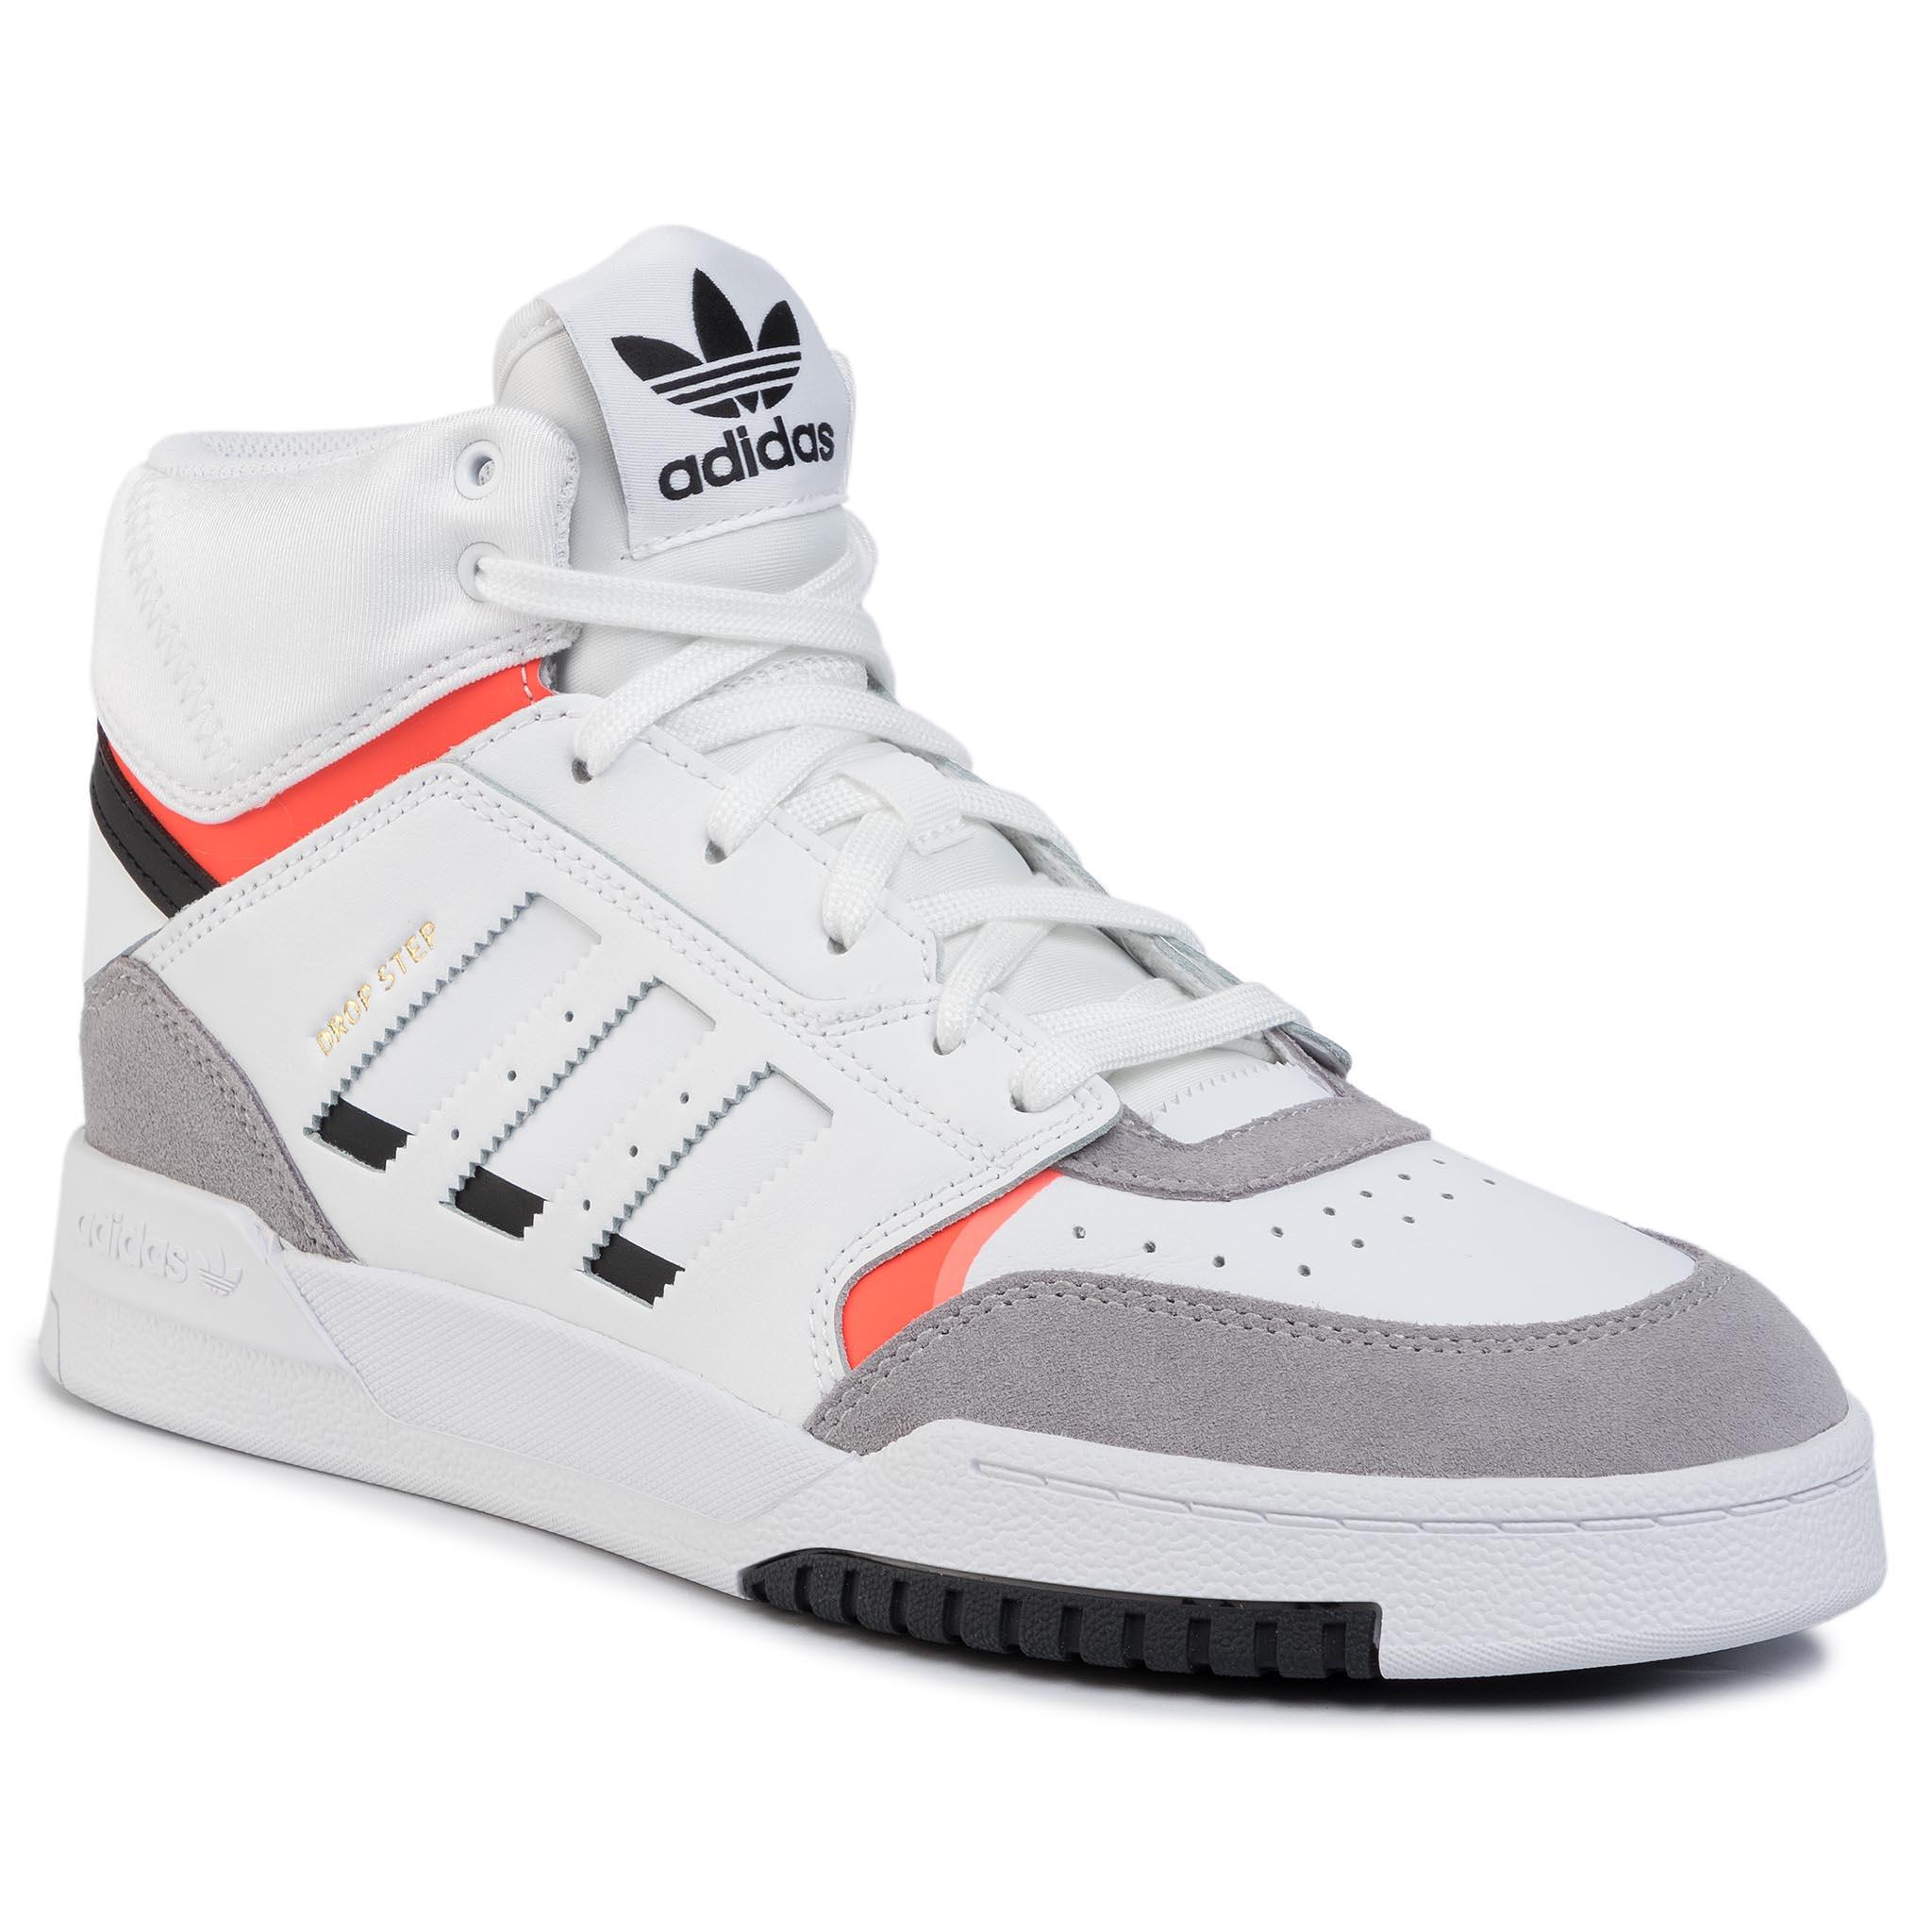 Cipő adidas Drop Step EE5220 FtwwhtLgraniSolred